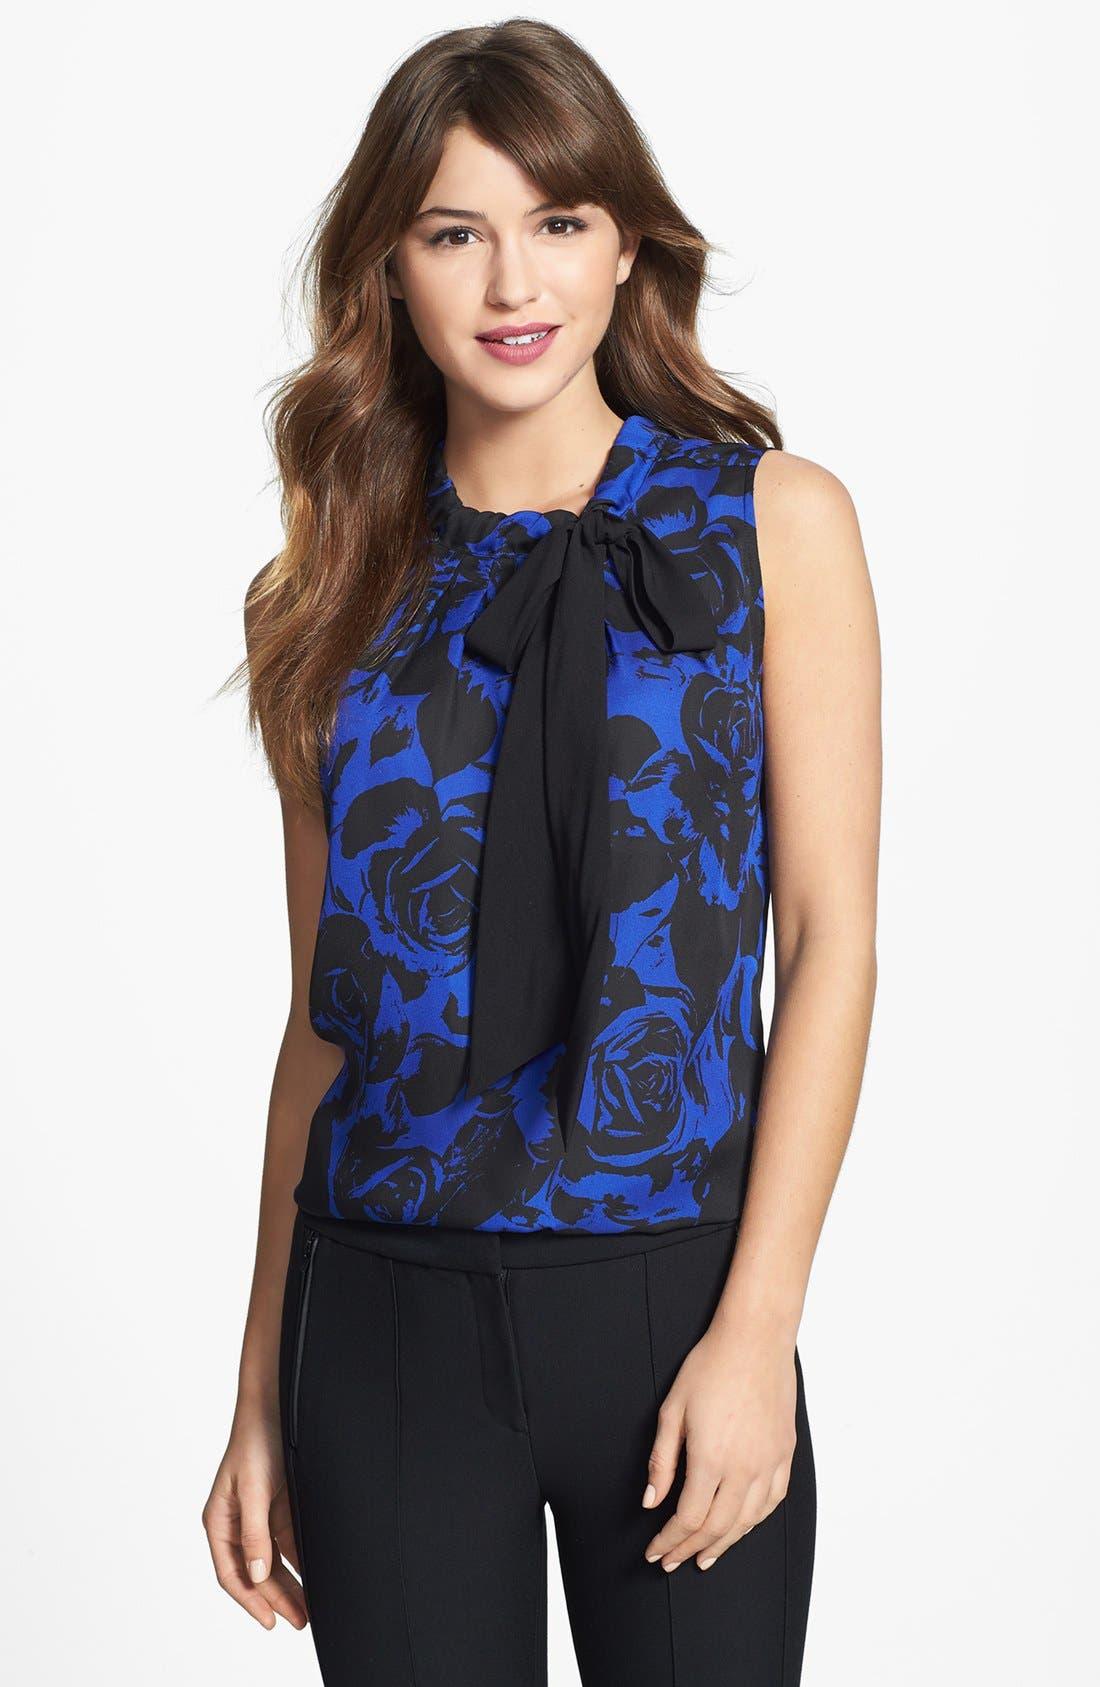 Alternate Image 1 Selected - Anne Klein Rose Print Tie Neck Blouse (Petite)